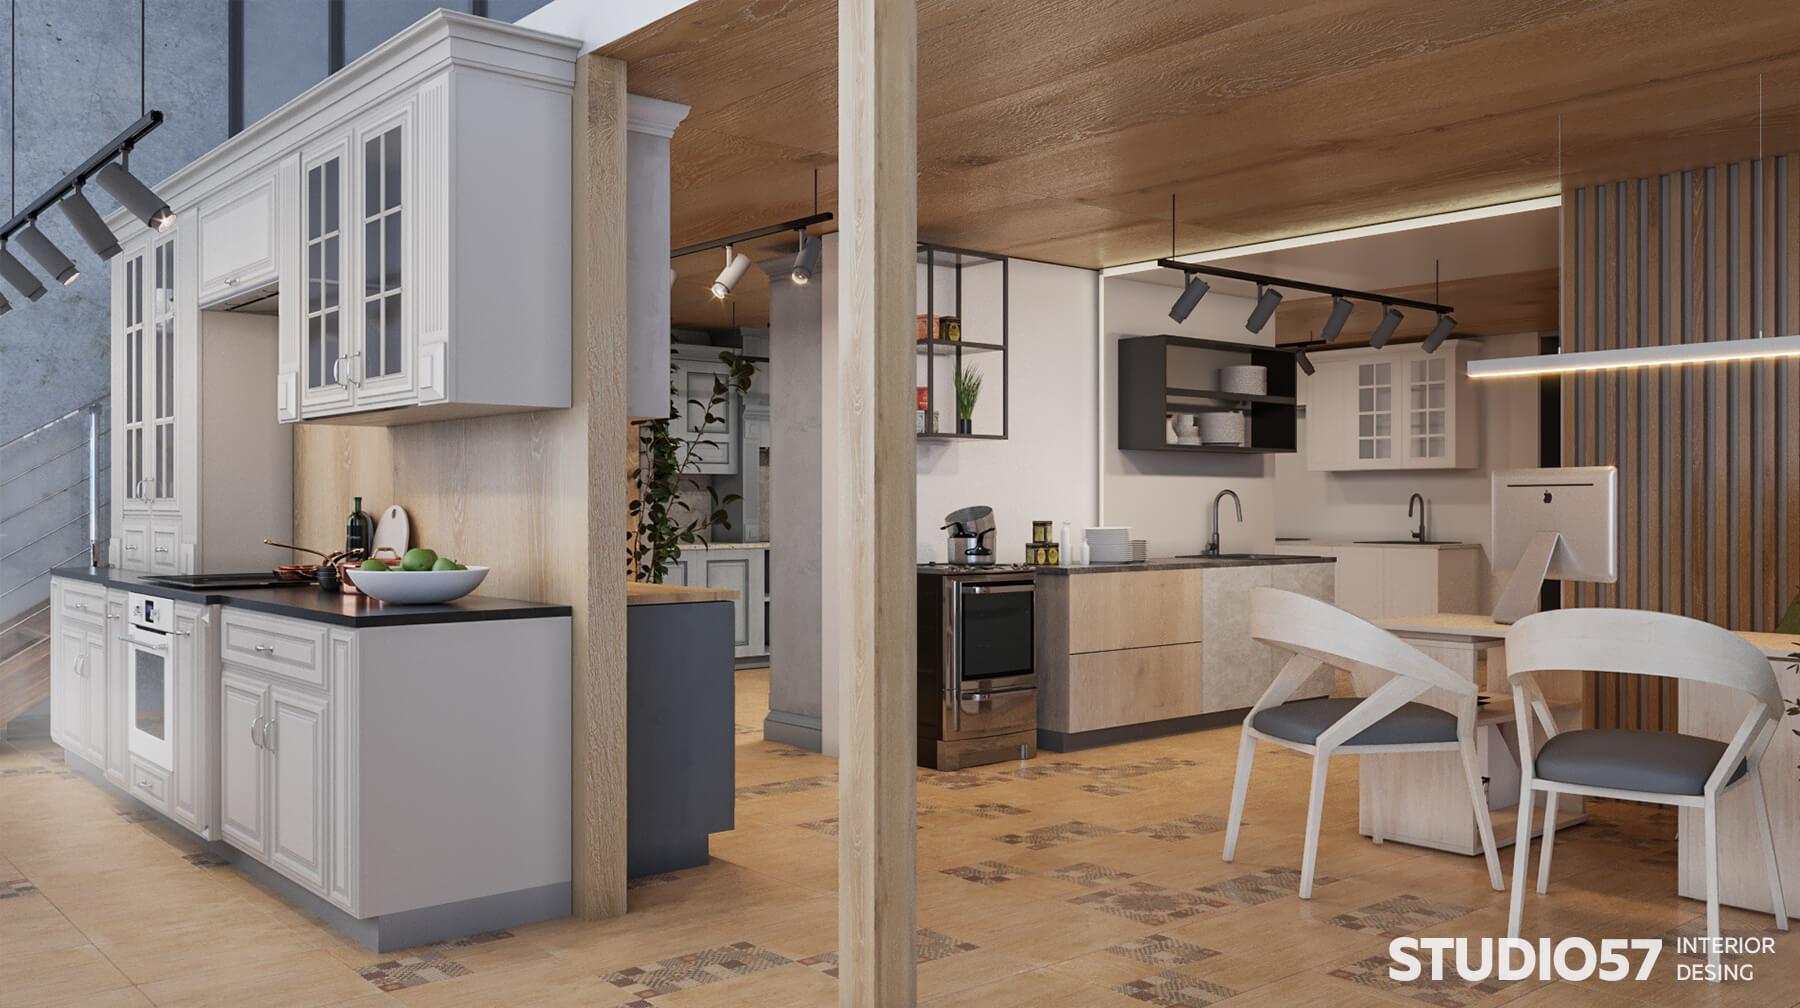 Retail-дизайн магазина кухонь